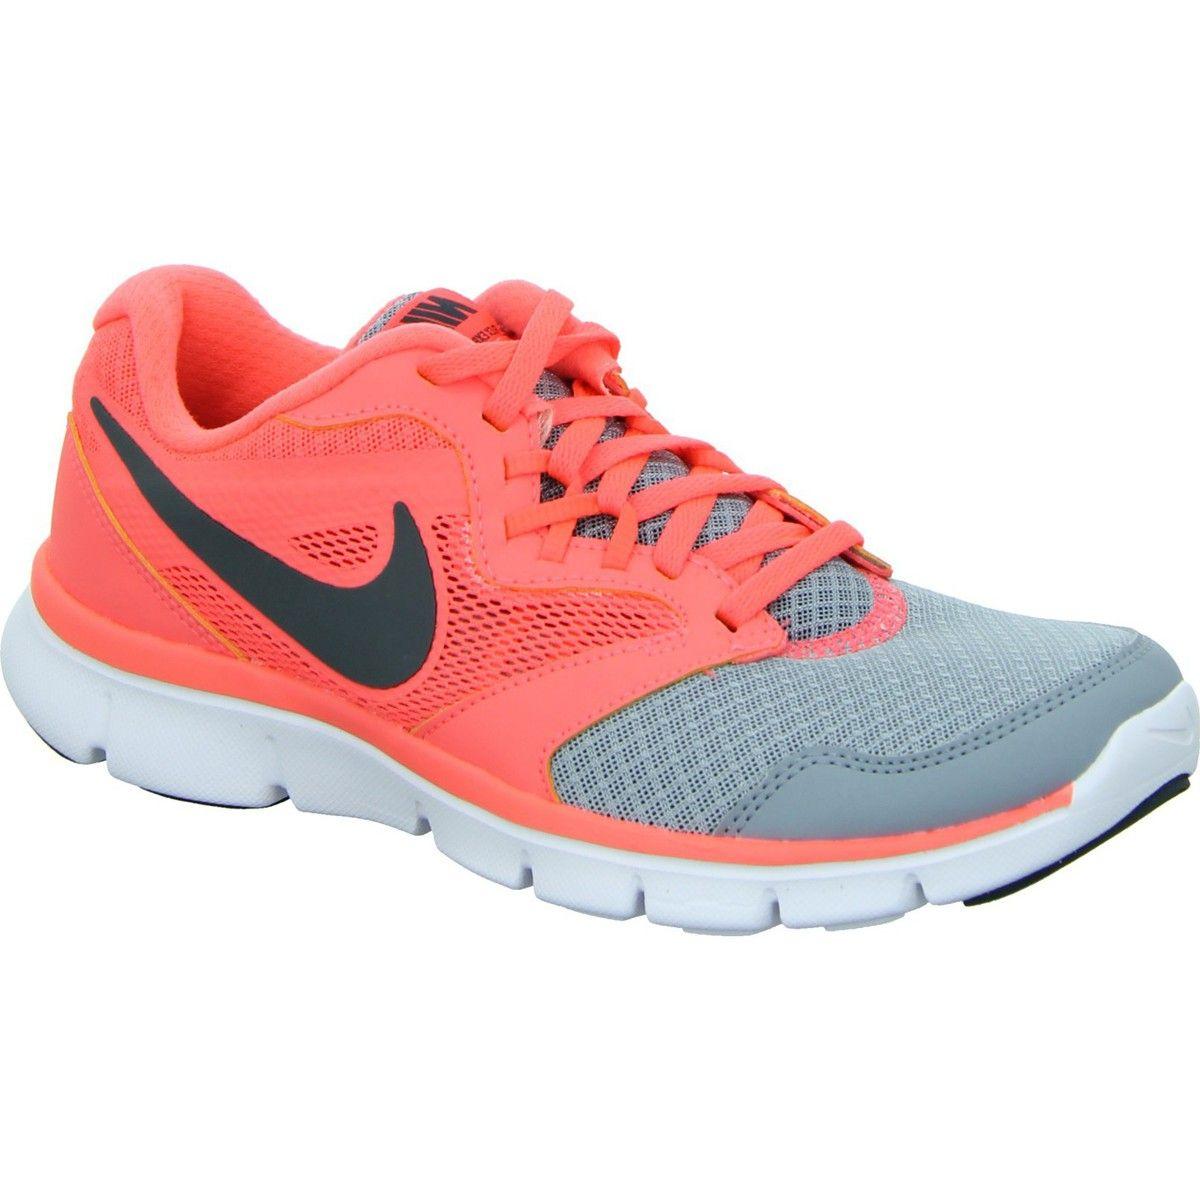 d92dbe36bd2555 Nike Damen Outdoor Nike Flex Experience RN 3 MSL 236569103 Neon-Orange